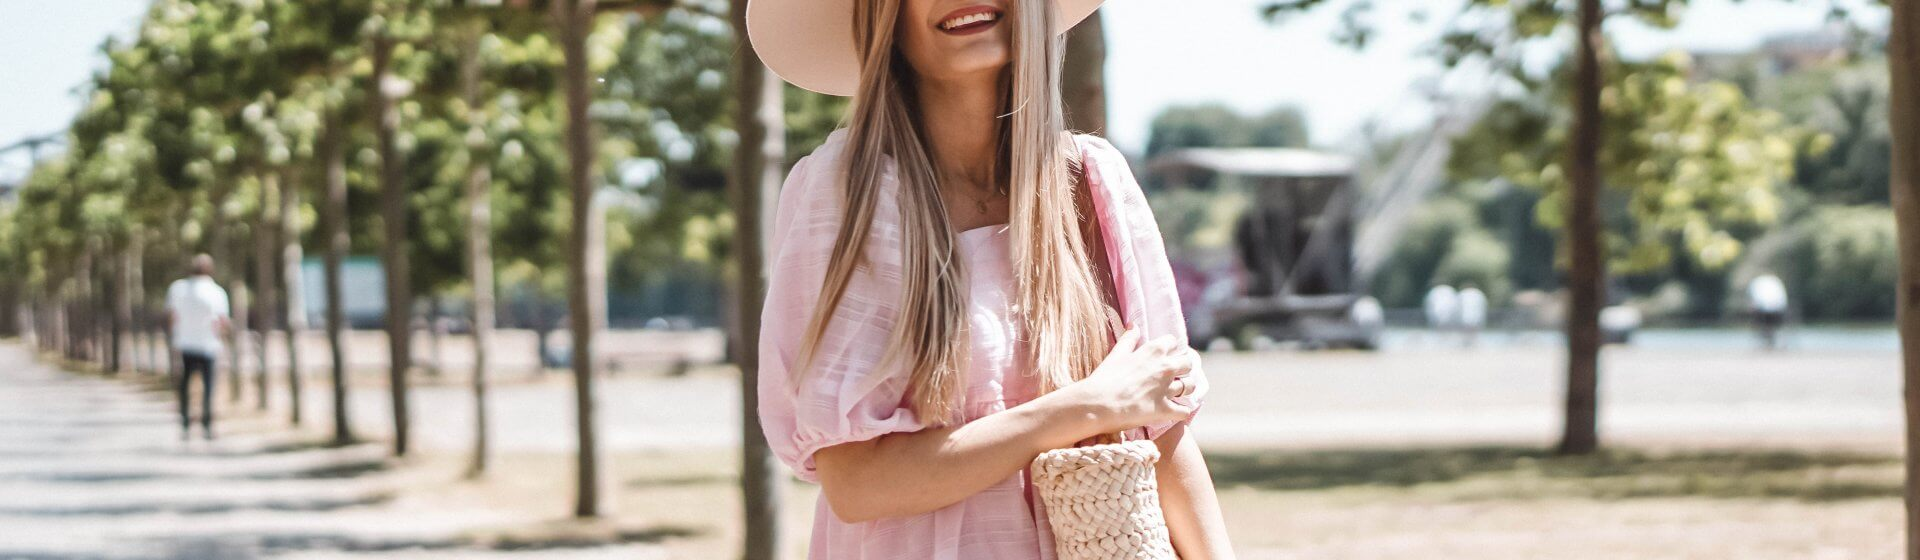 Pastell-Töne im Trend: Rosa Kleid